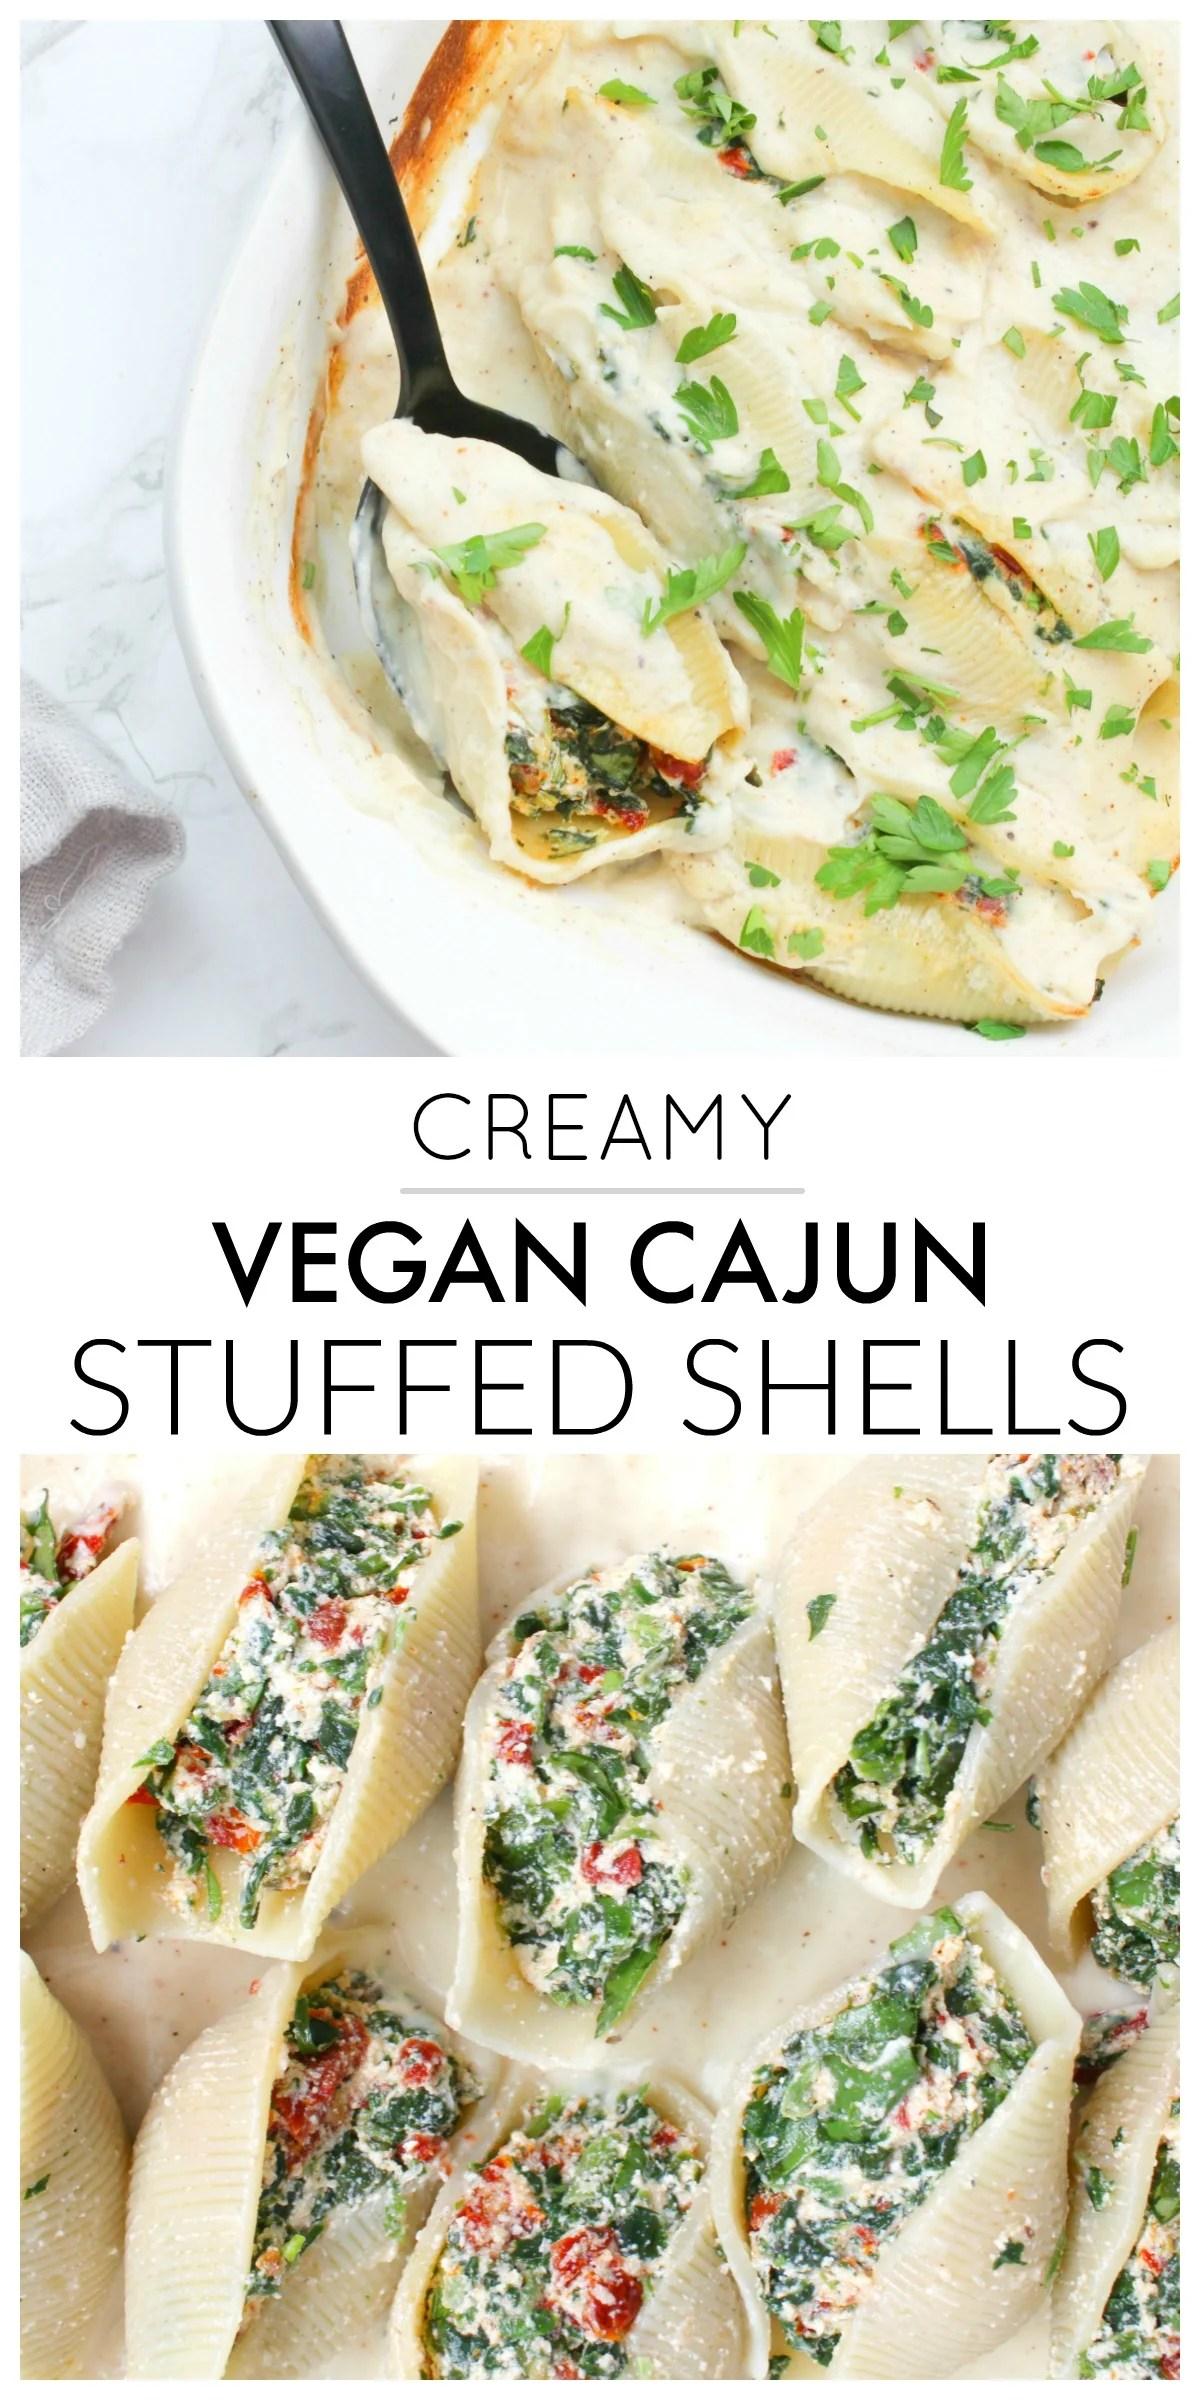 TheseCreamy Vegan Cajun Stuffed Shells are the ultimate casserole dinner. Lightened up by using cauliflower cream sauce and a tofu ricotta | ThisSavoryVegan.com #thissavoryvegan #vegancasserole